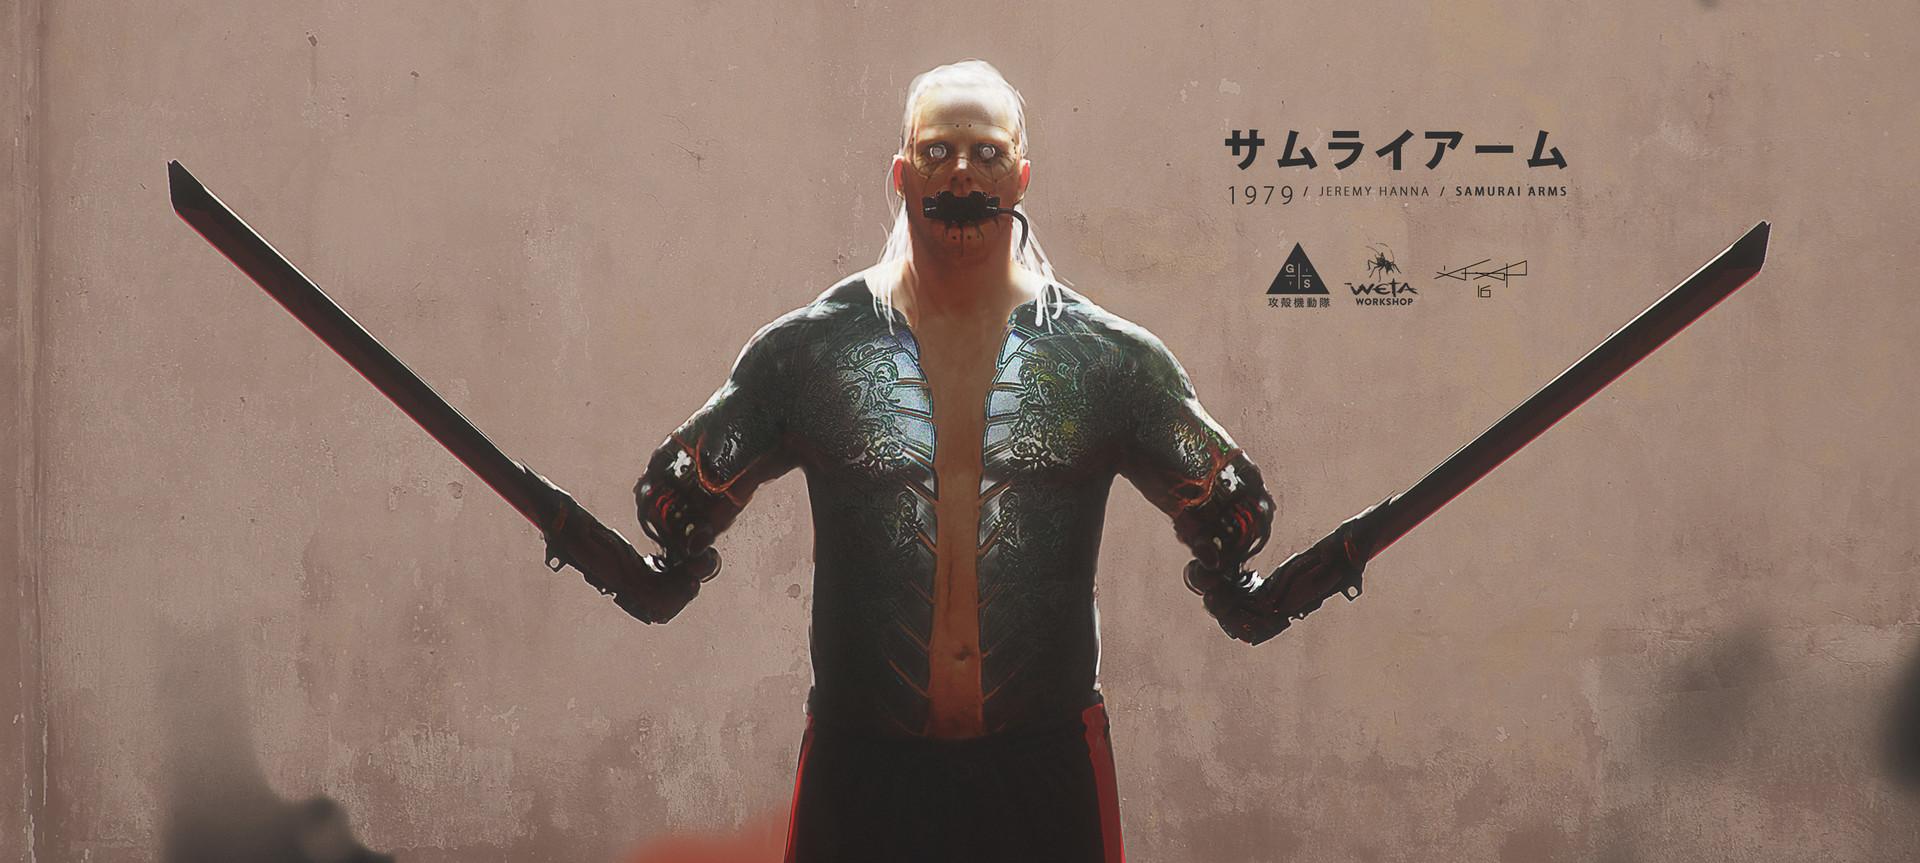 Jeremy hanna samurai arms 01 jh